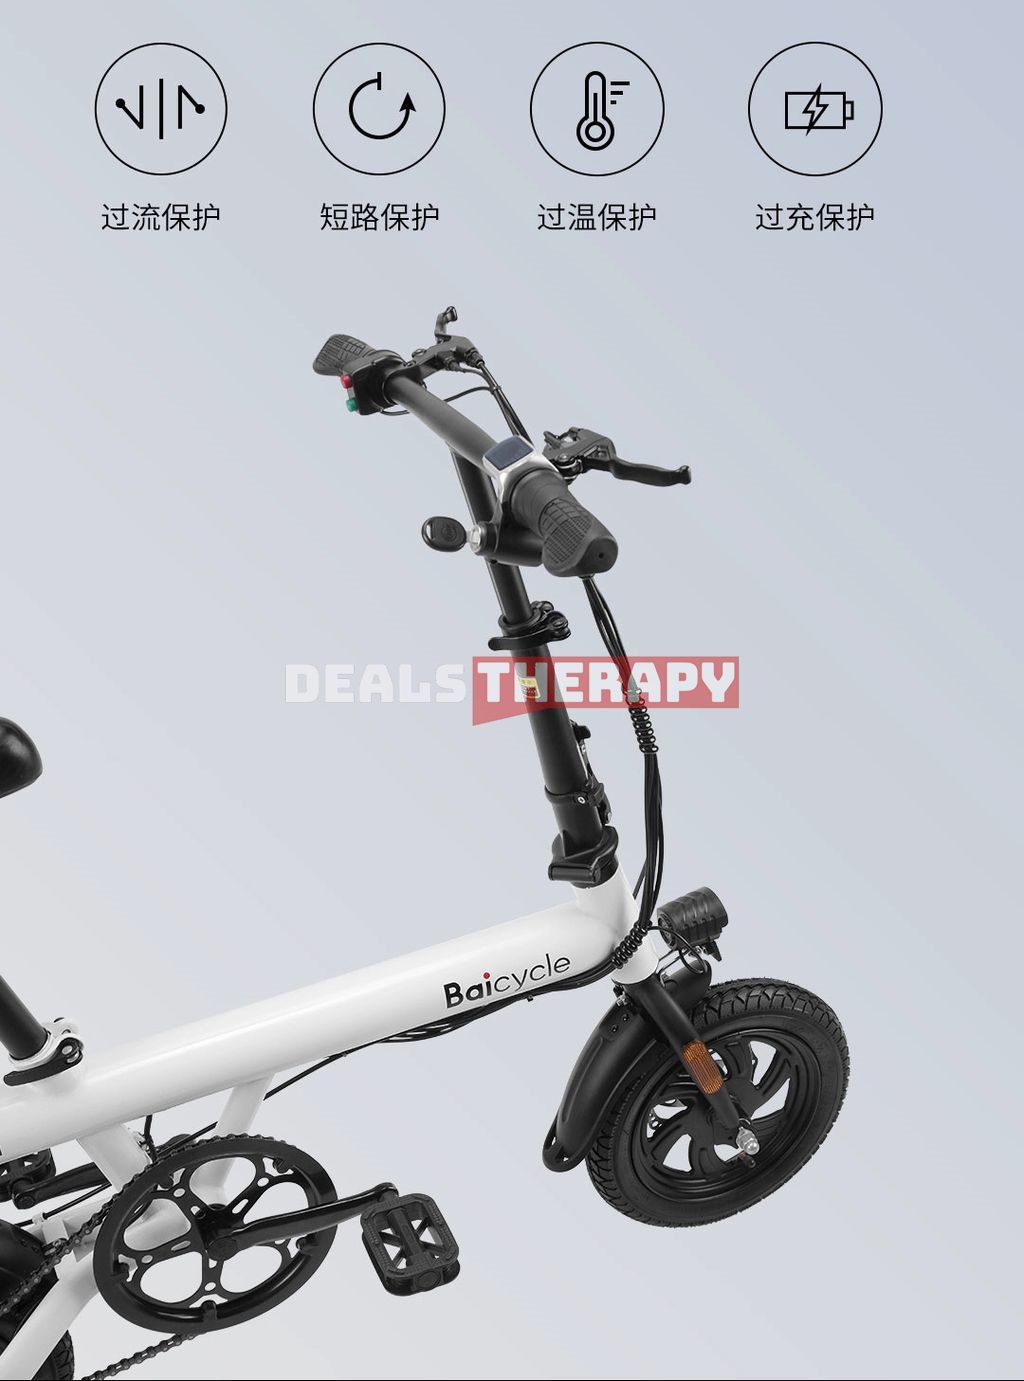 Baicycle Xiaobai S1